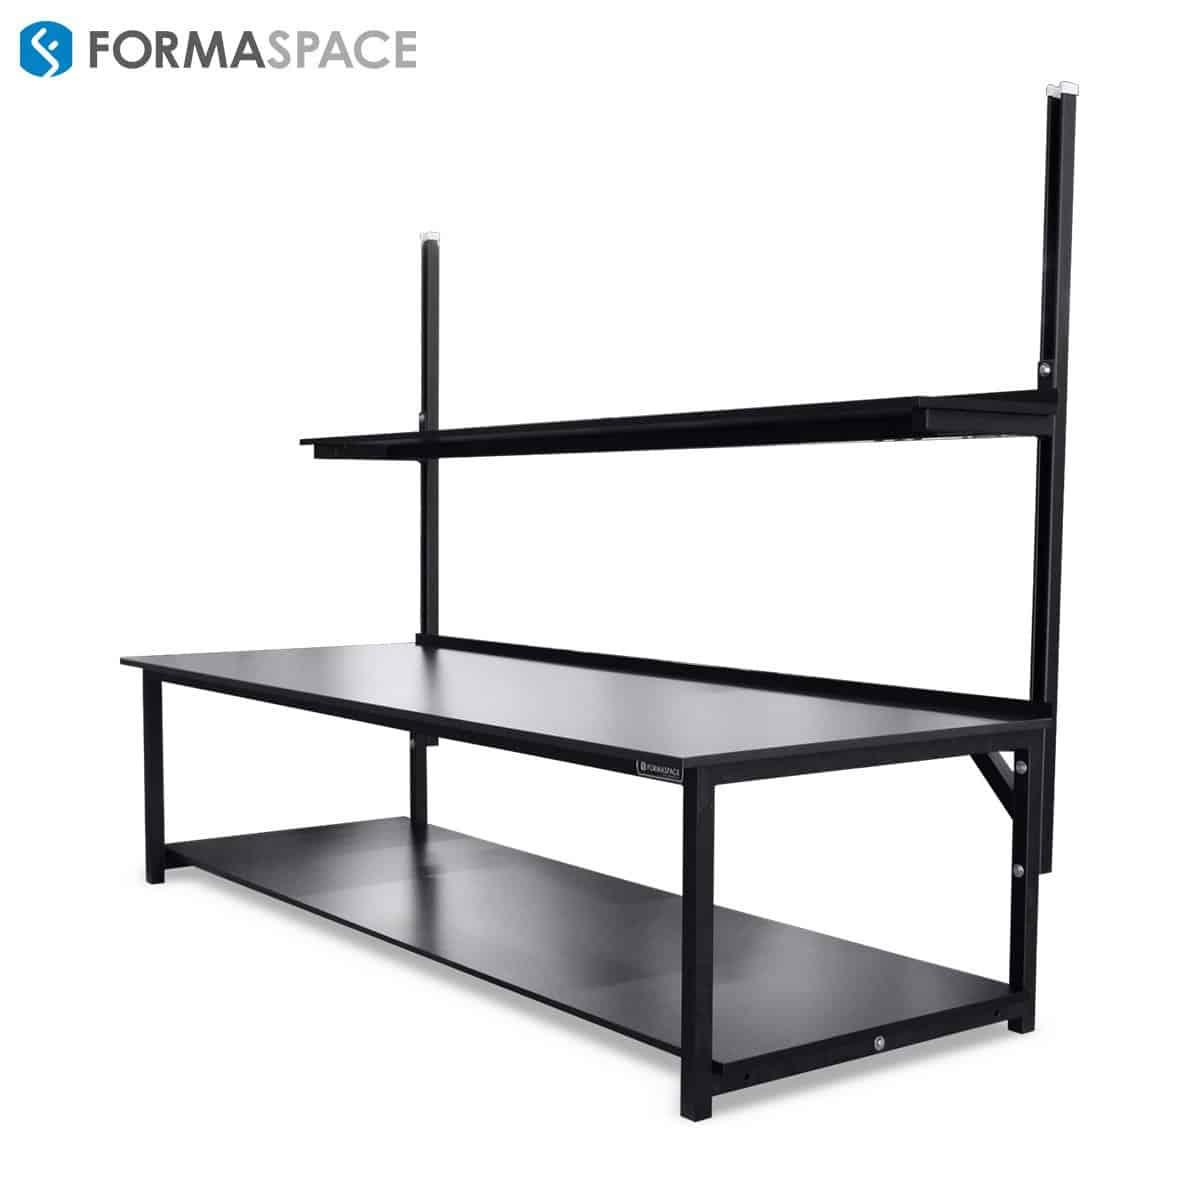 large phenolic workbench with upper shelves